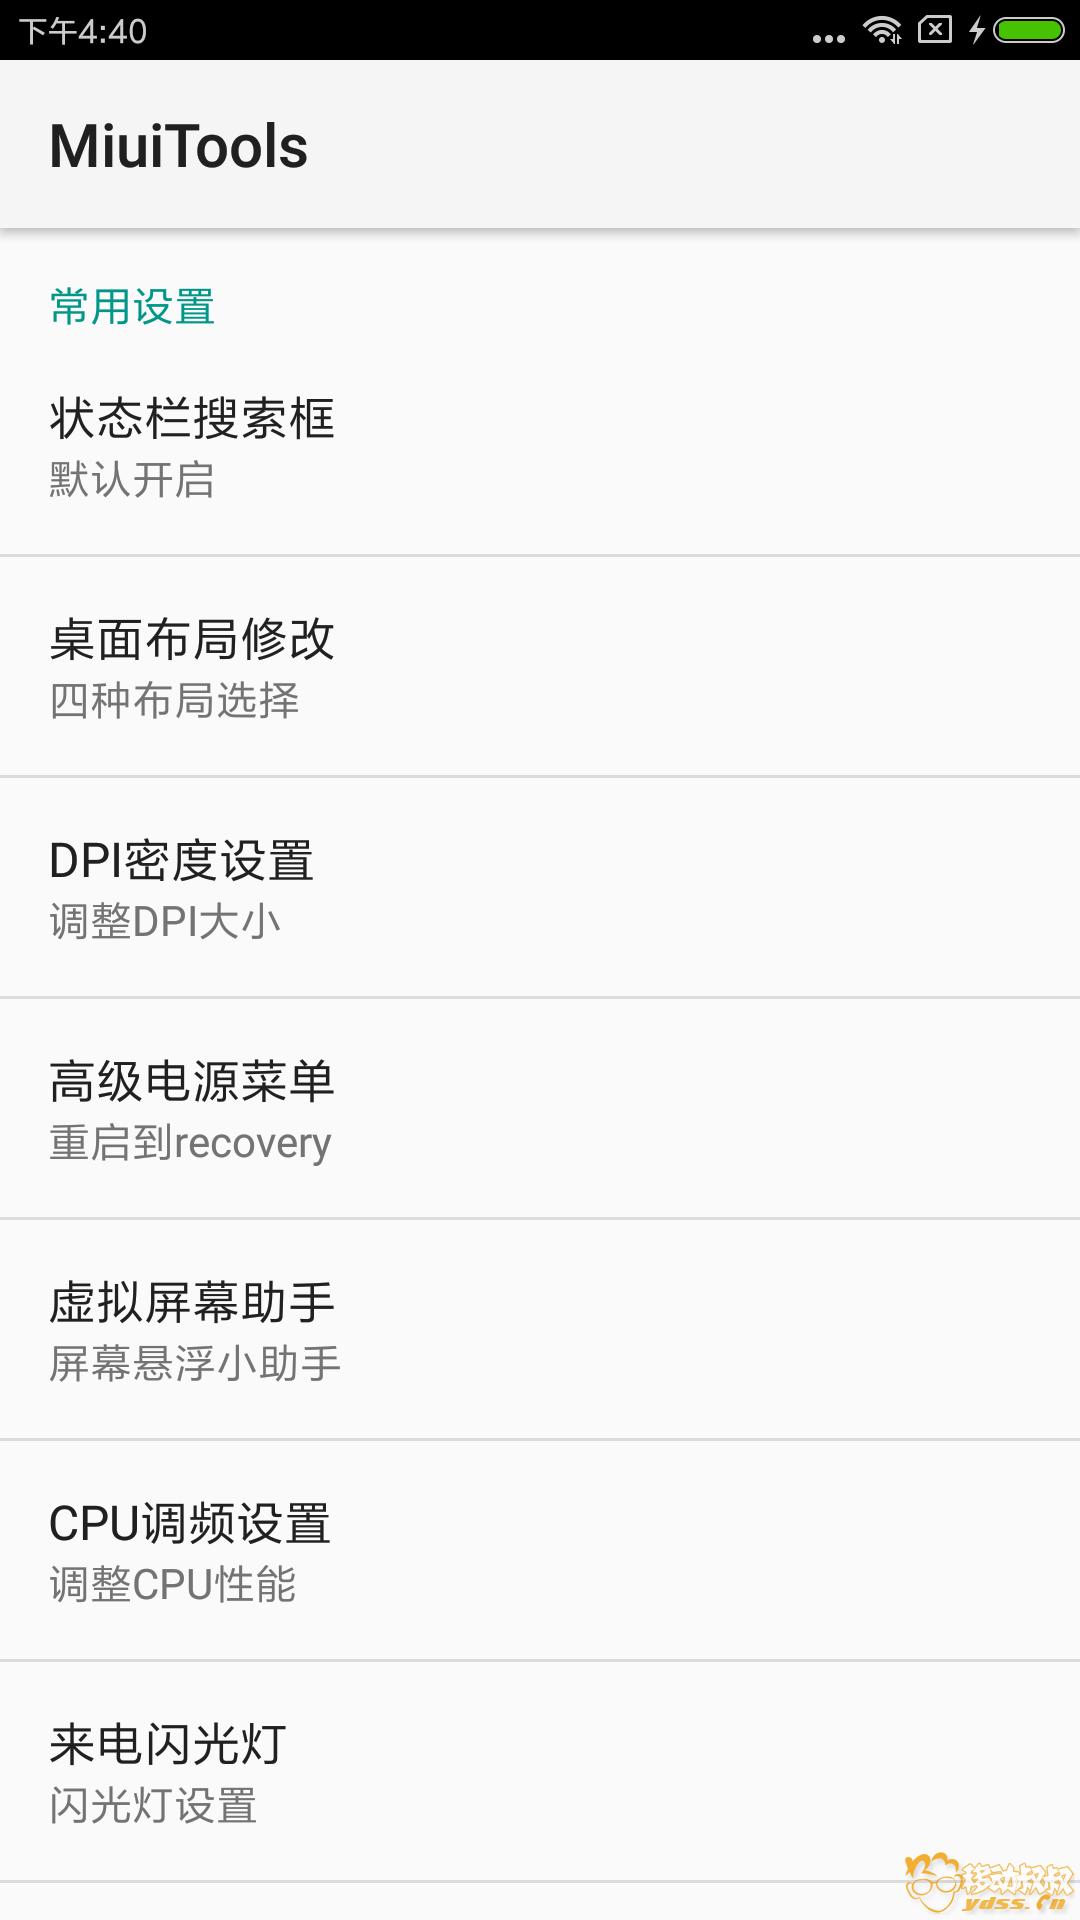 Screenshot_2018-01-13-16-40-02-884_com.anzhi.hwsettings.png